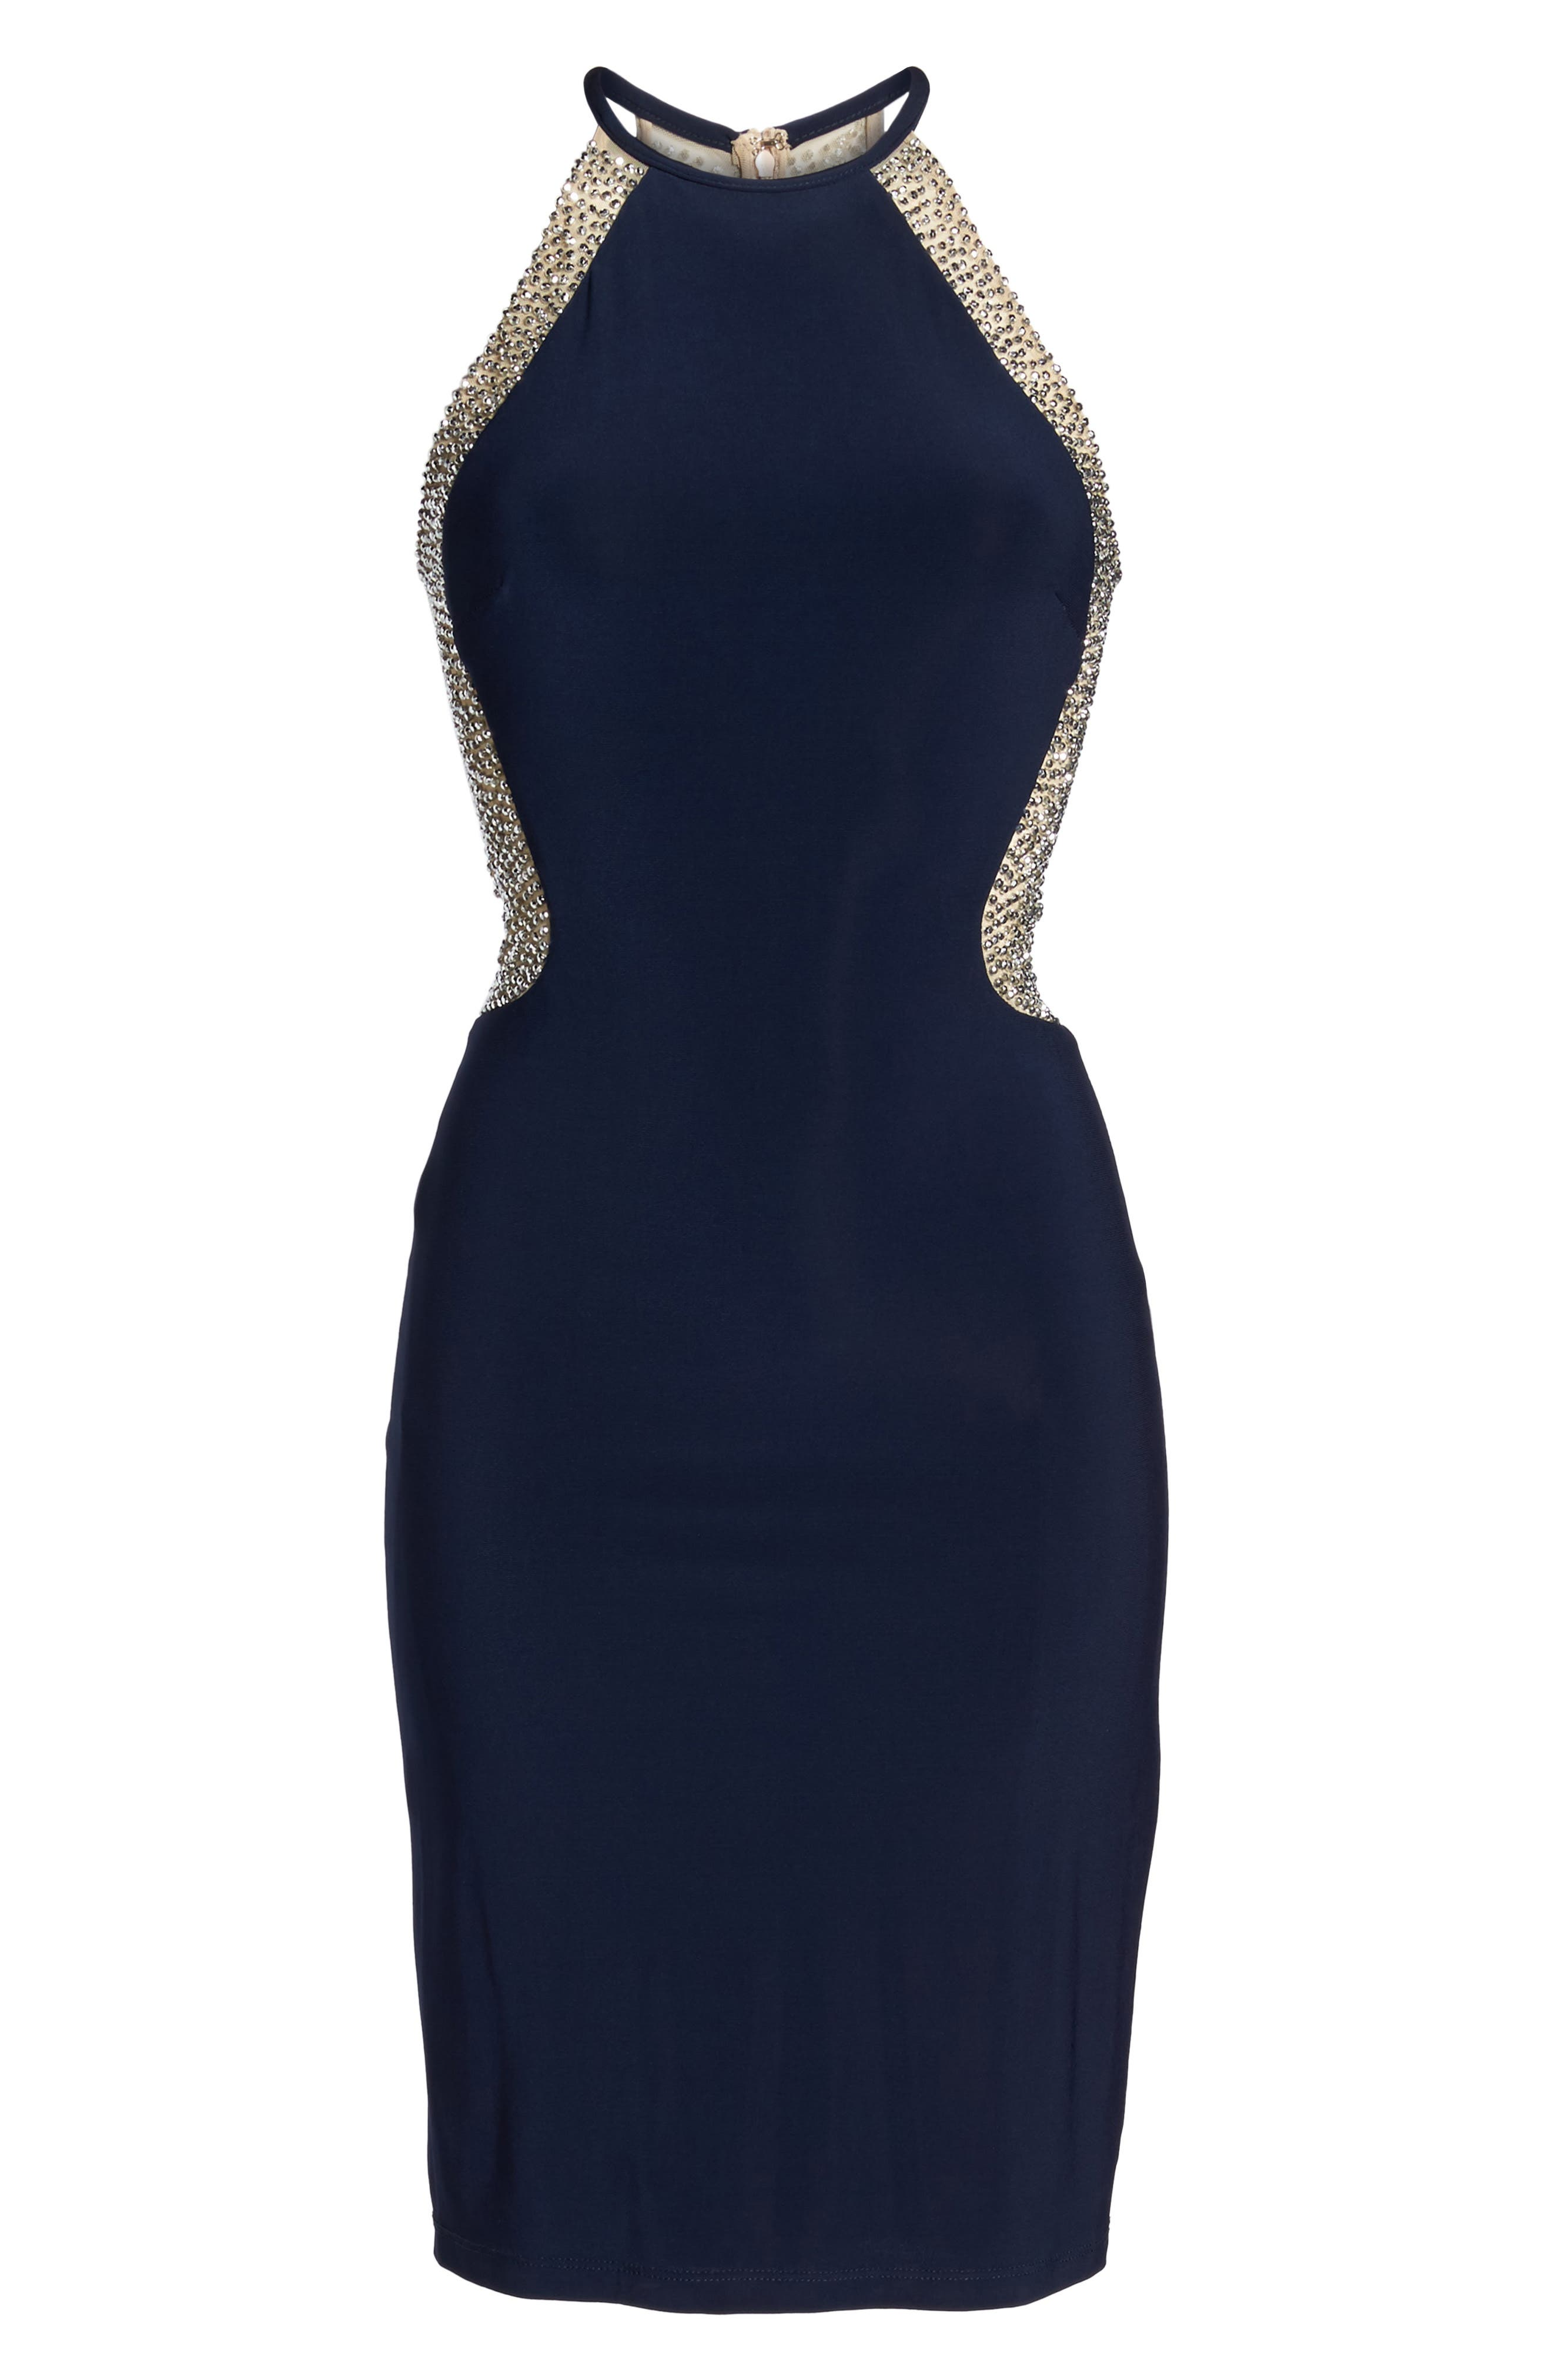 Xscape Beaded Mesh & Jersey Sheath Dress